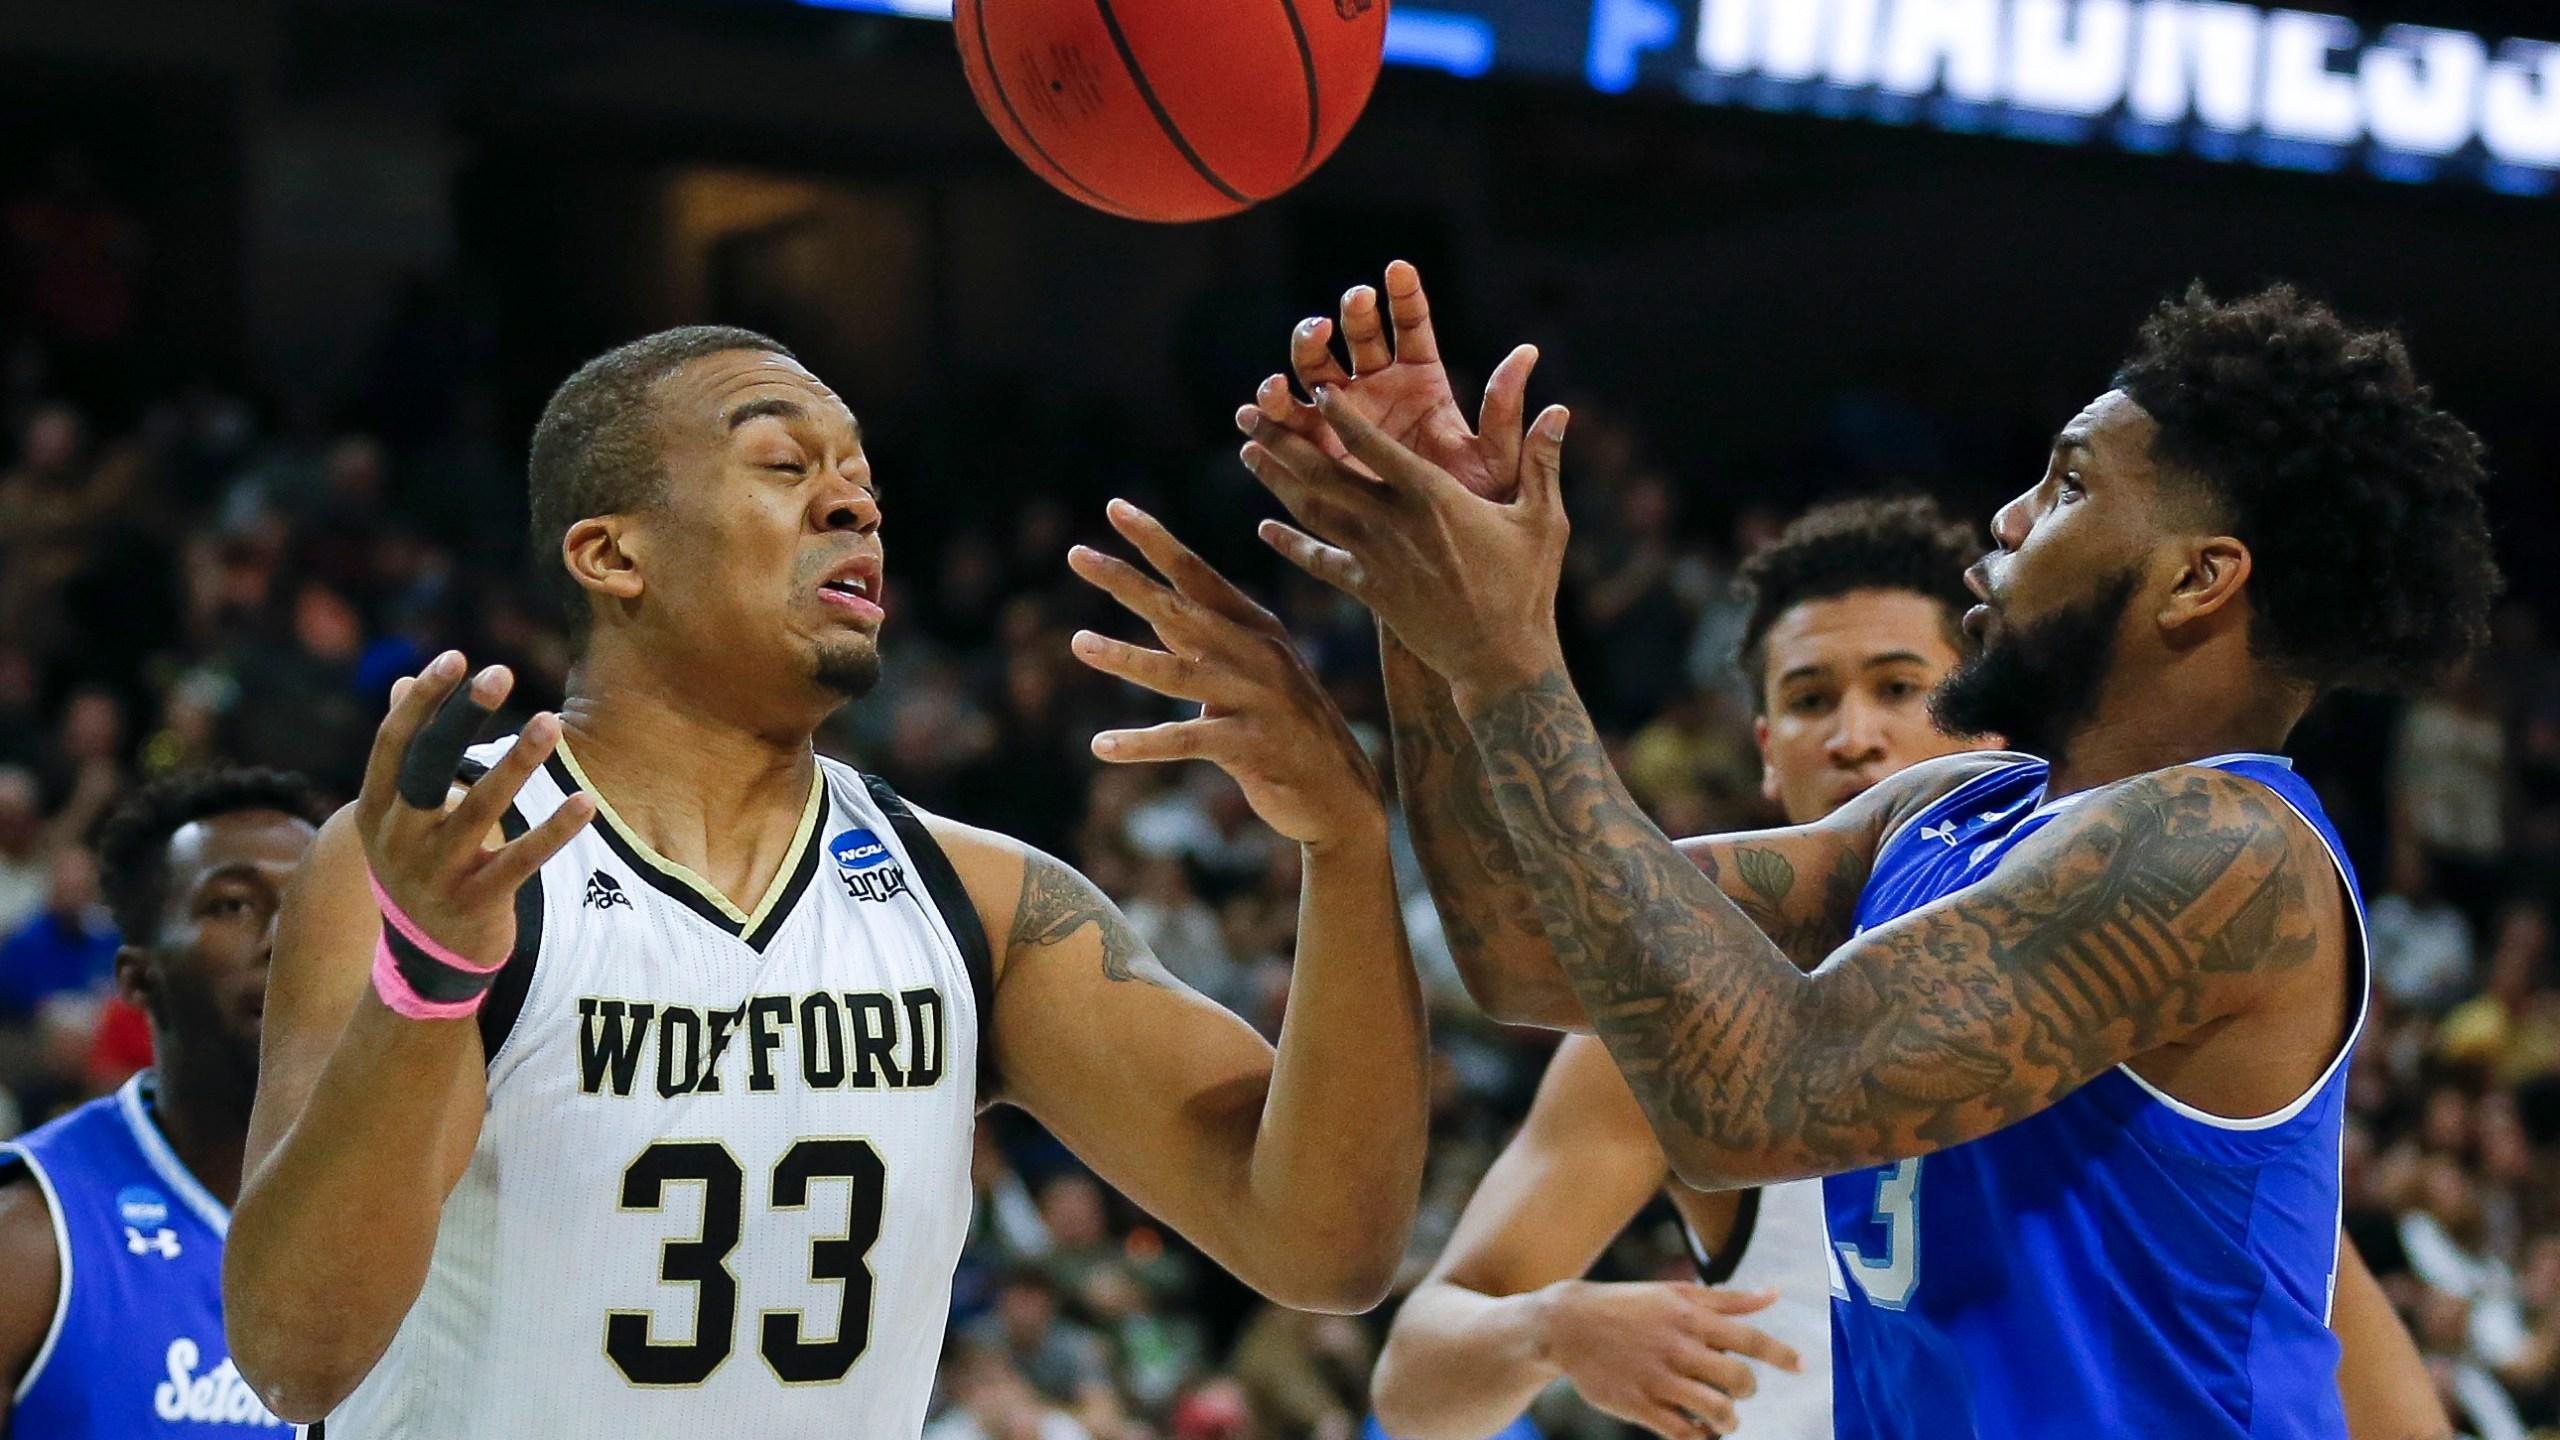 NCAA_Seton_Hall_Wofford_Basketball_77855-159532.jpg98534326